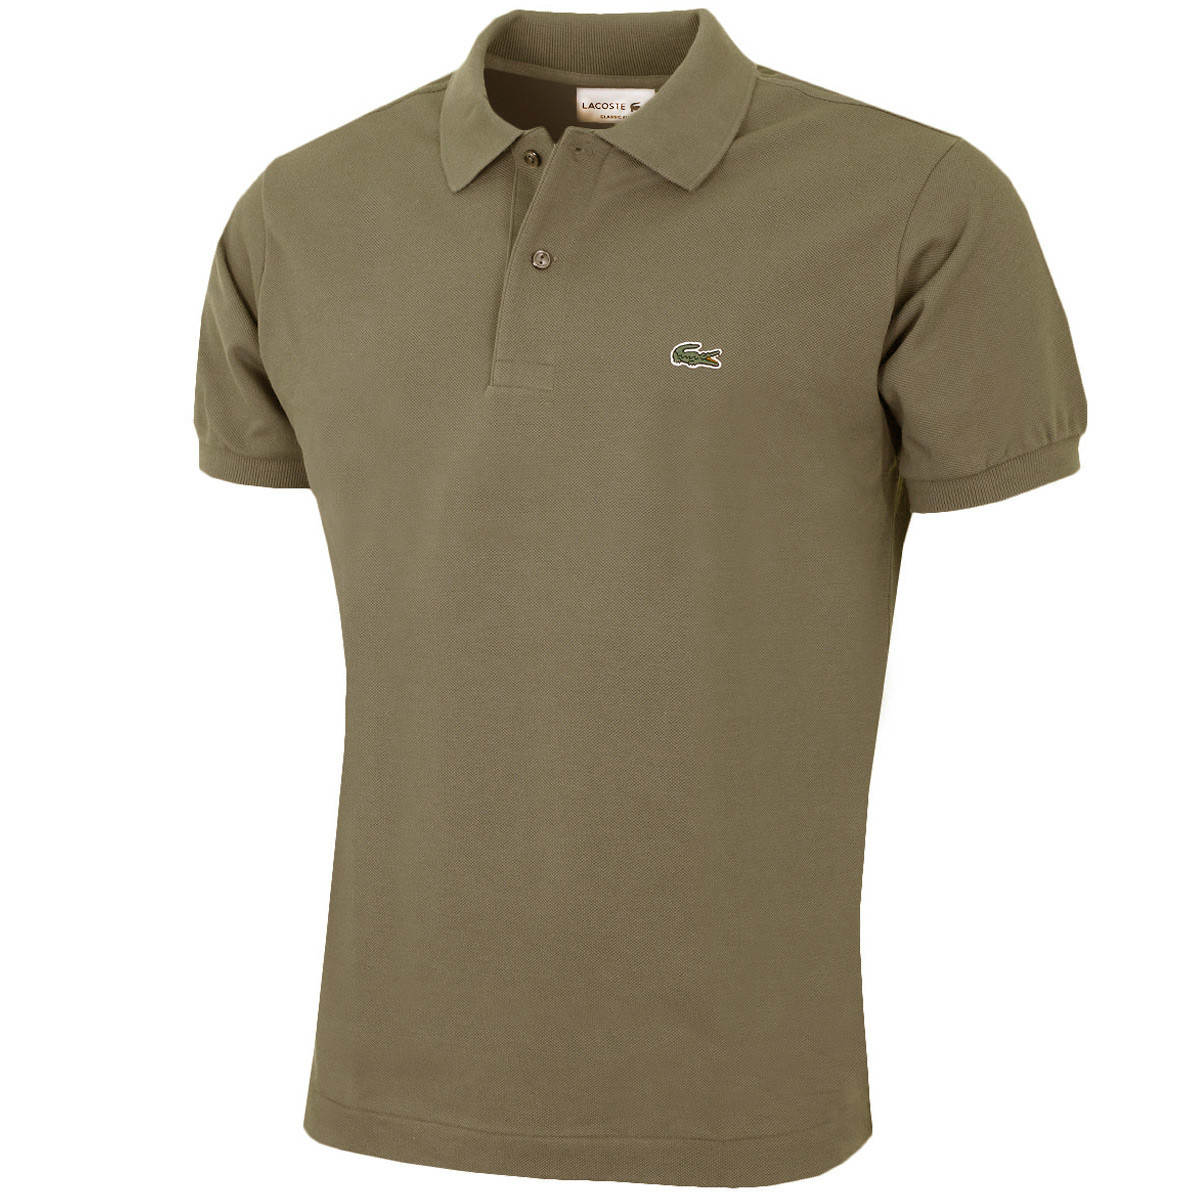 f6c3afa81 Lacoste Mens Classic Cotton L1212 Short Sleeve Polo Shirt